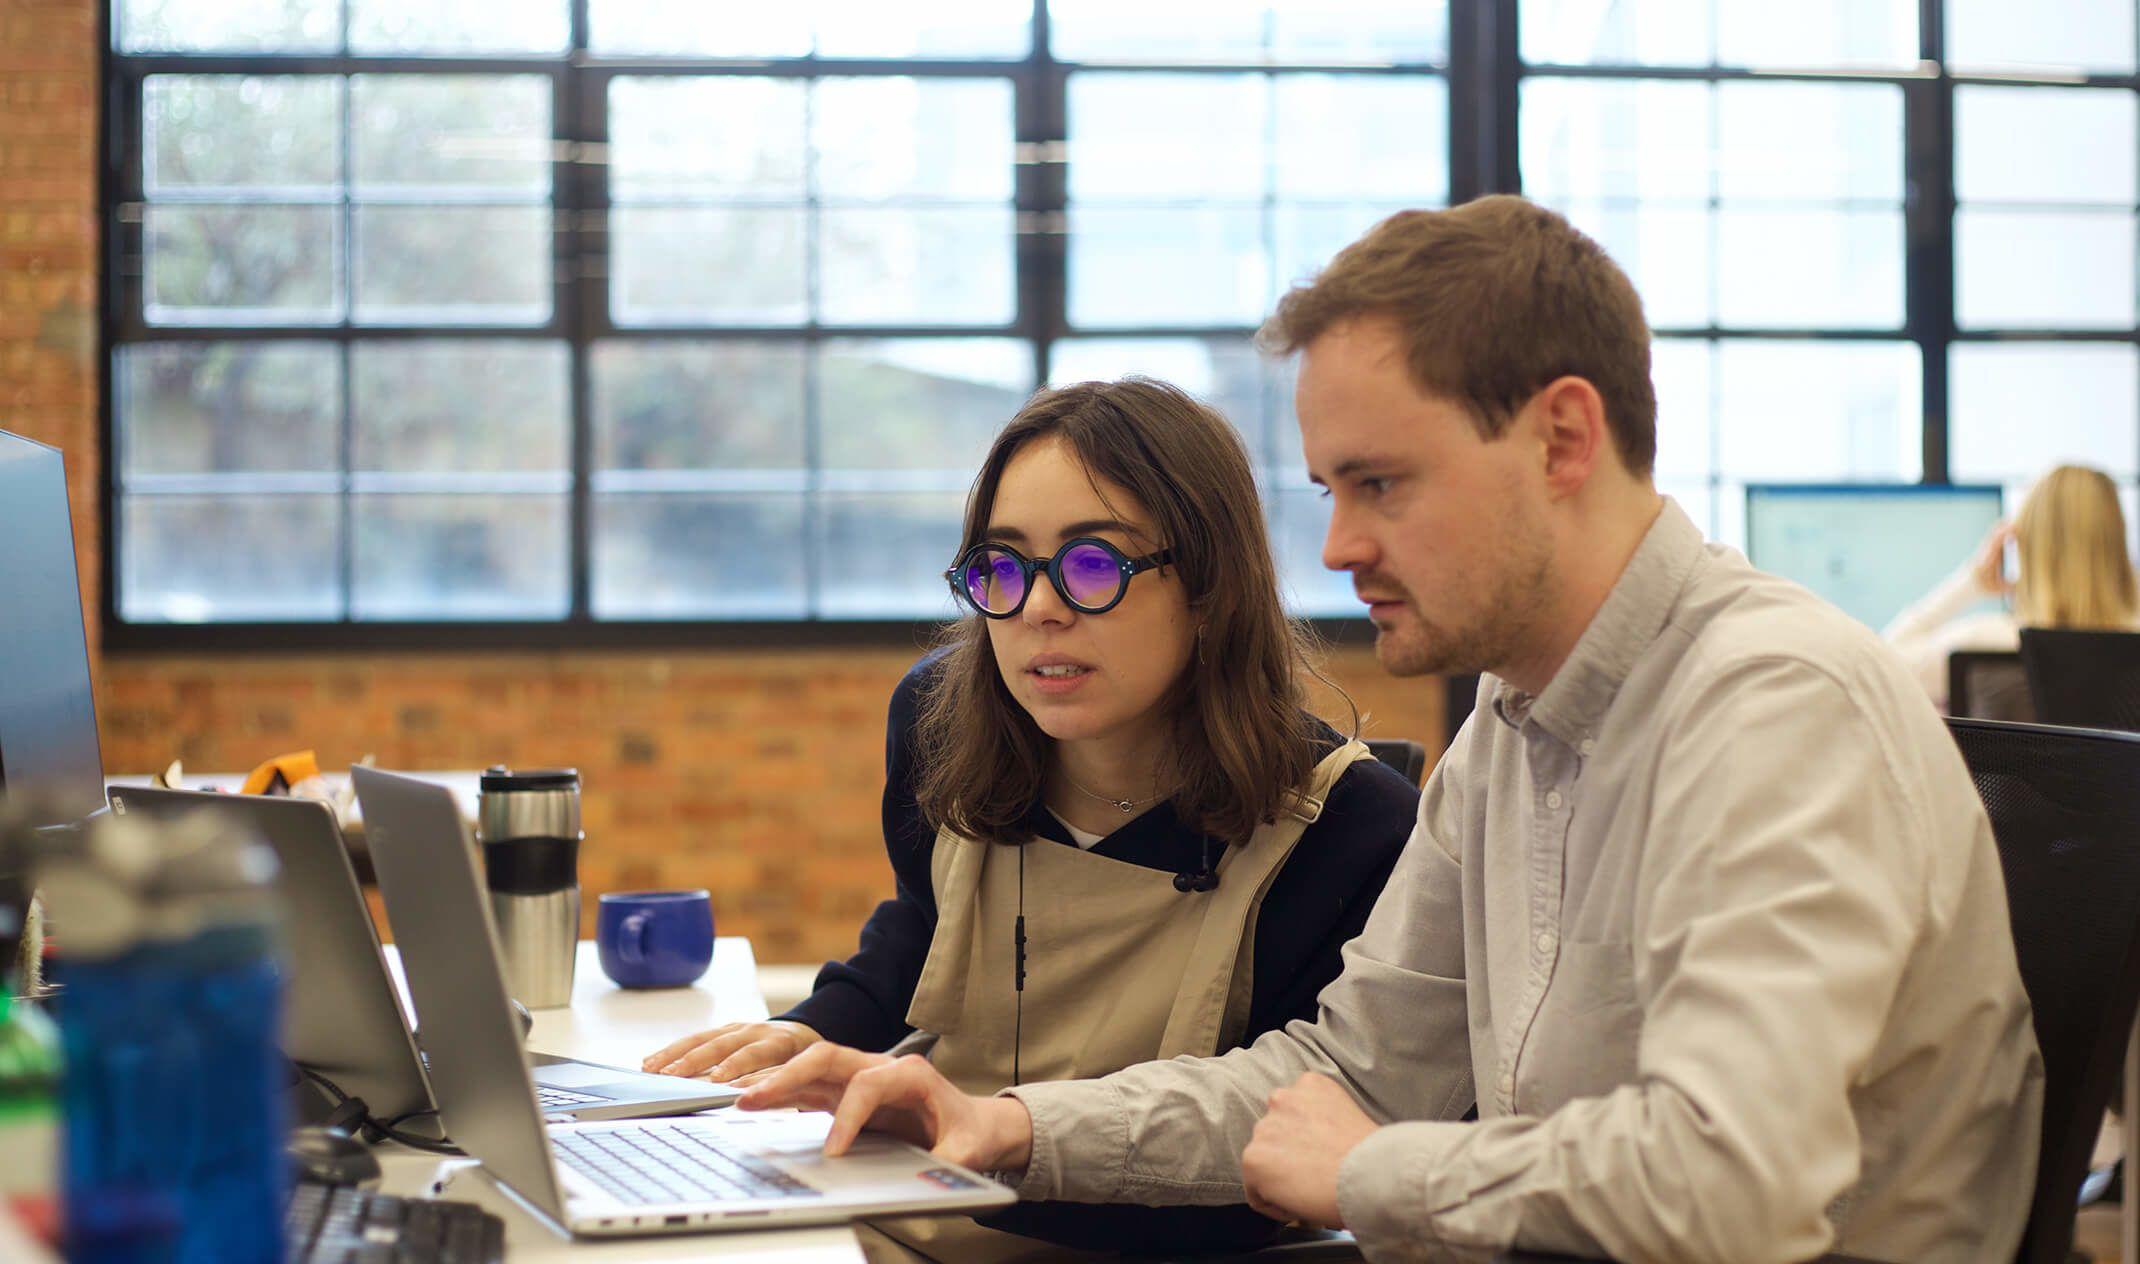 woman and man looking at laptop screen